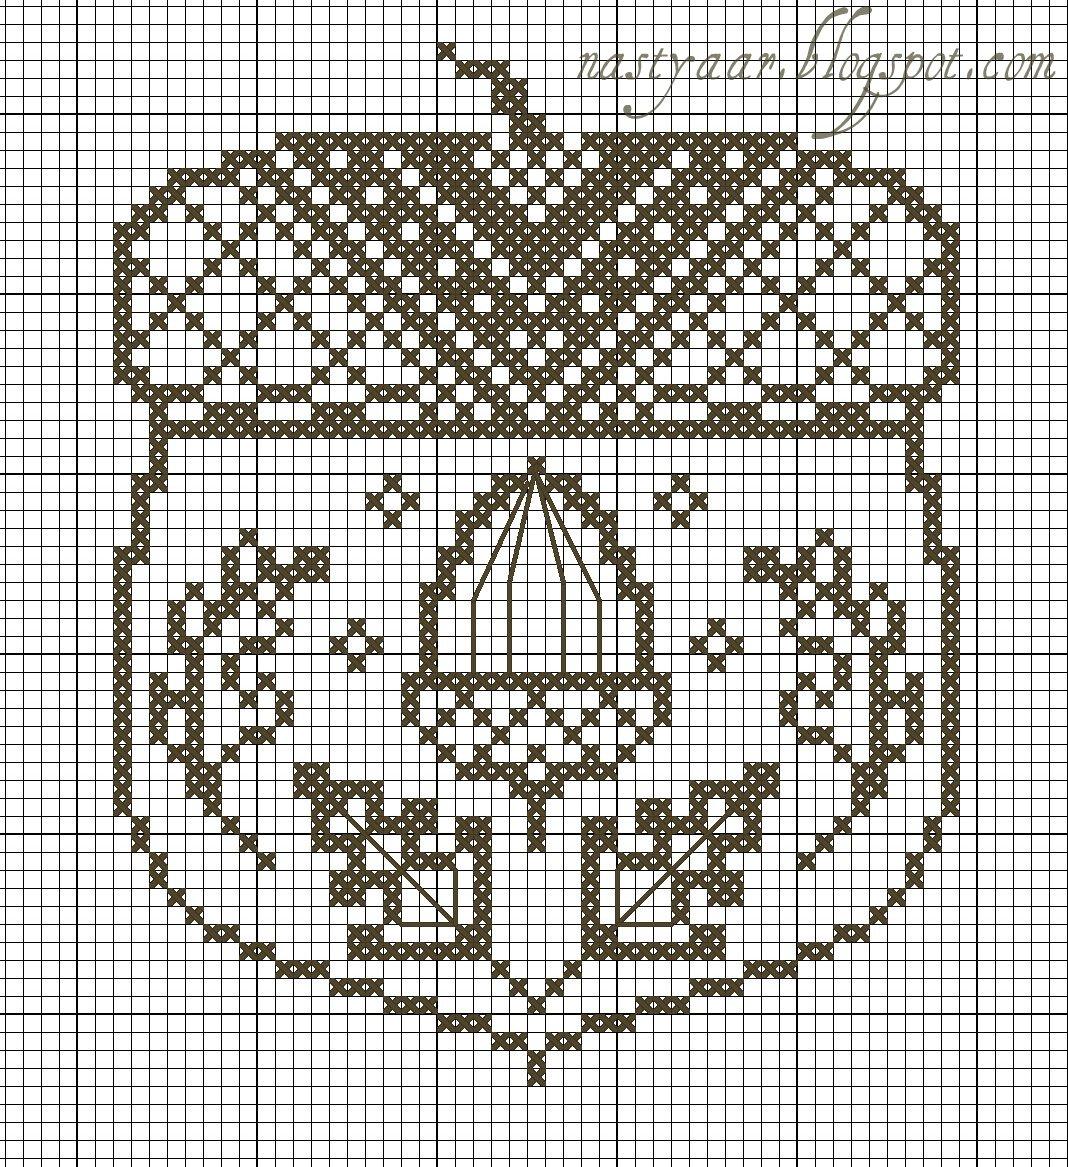 Вышивка крестом желудь схема 53